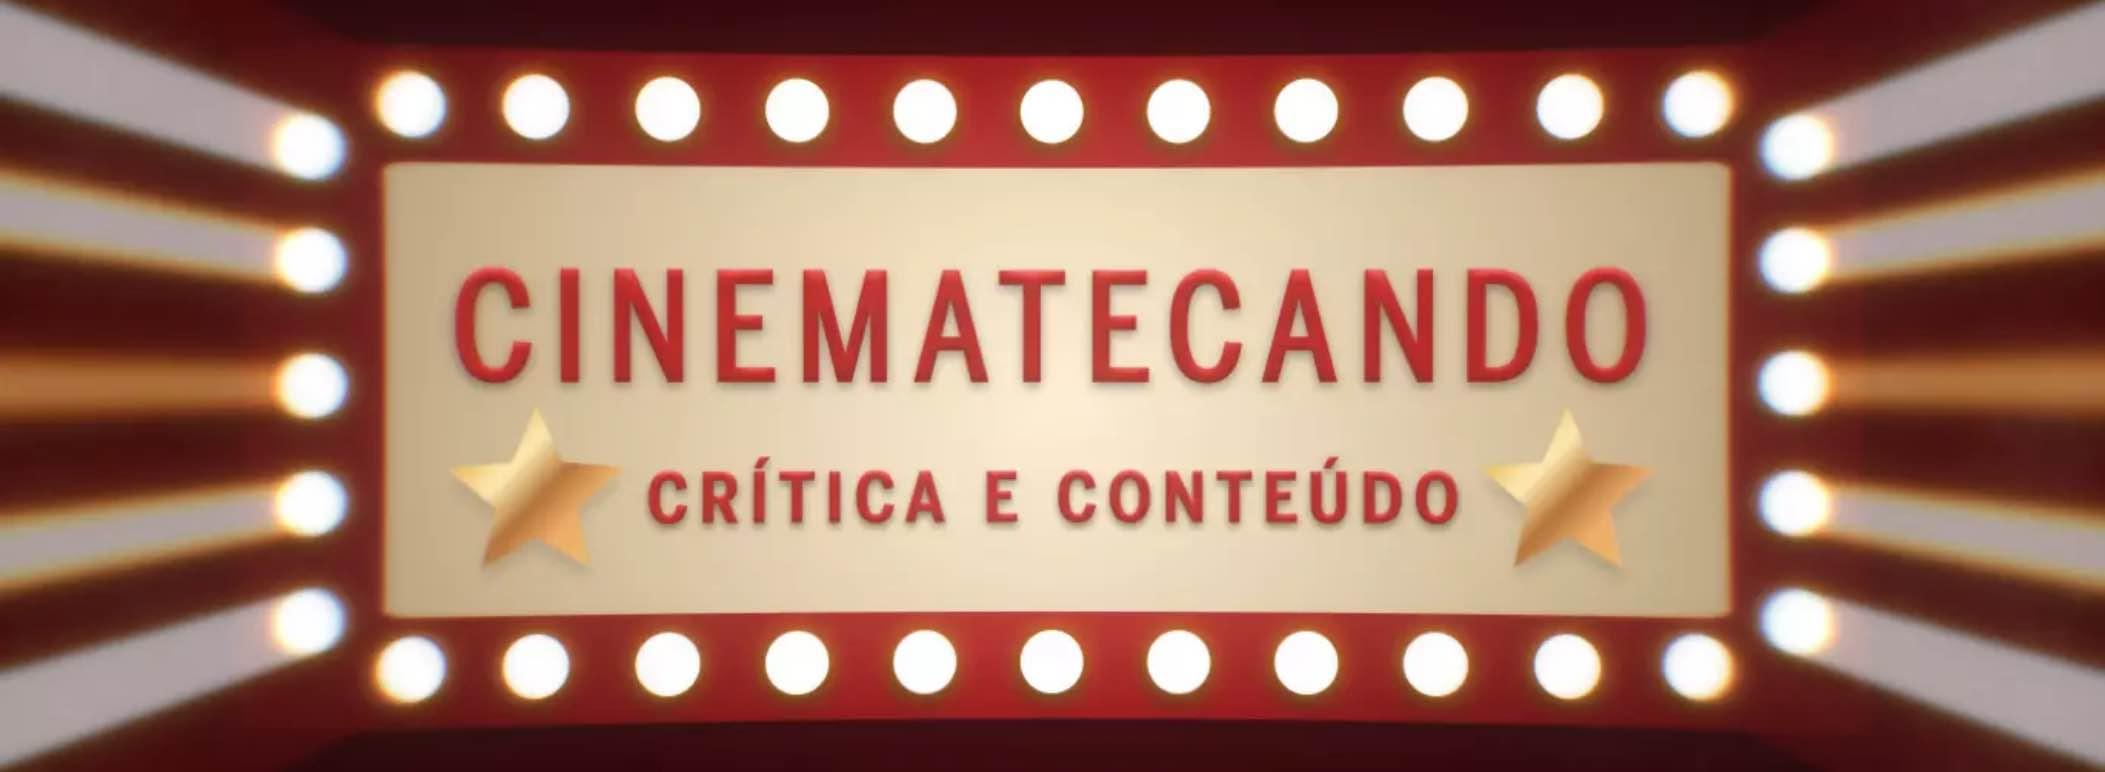 Cinematecando